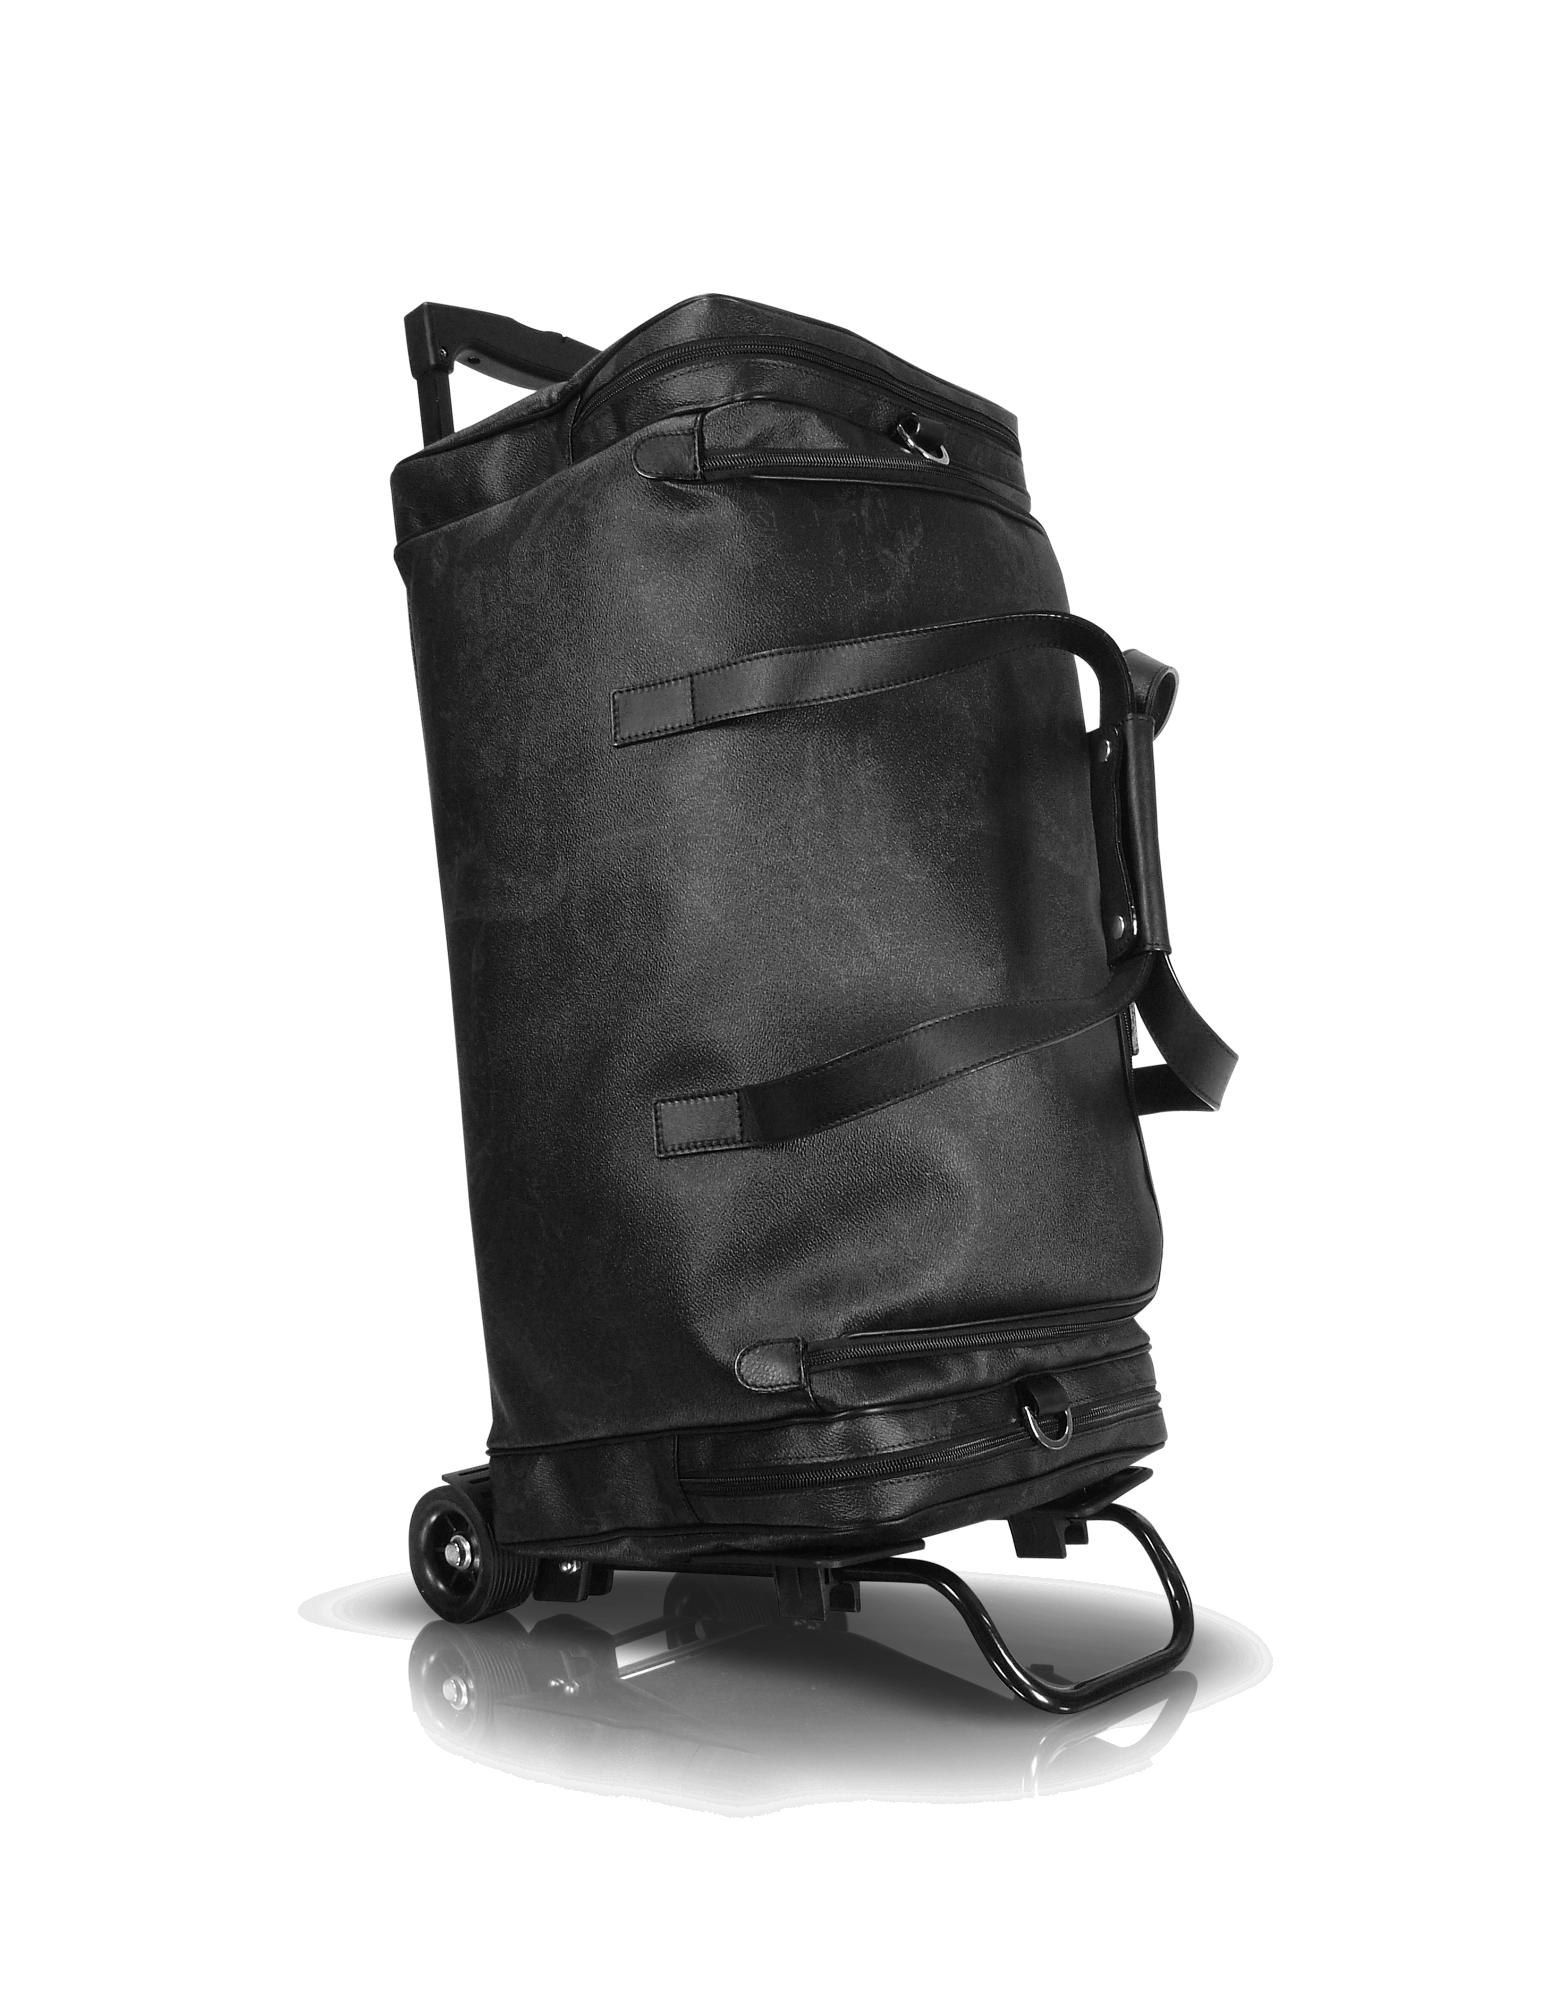 Image of 1a Prima Classe - Geoblack Duffel Travel Bag w/Wheels